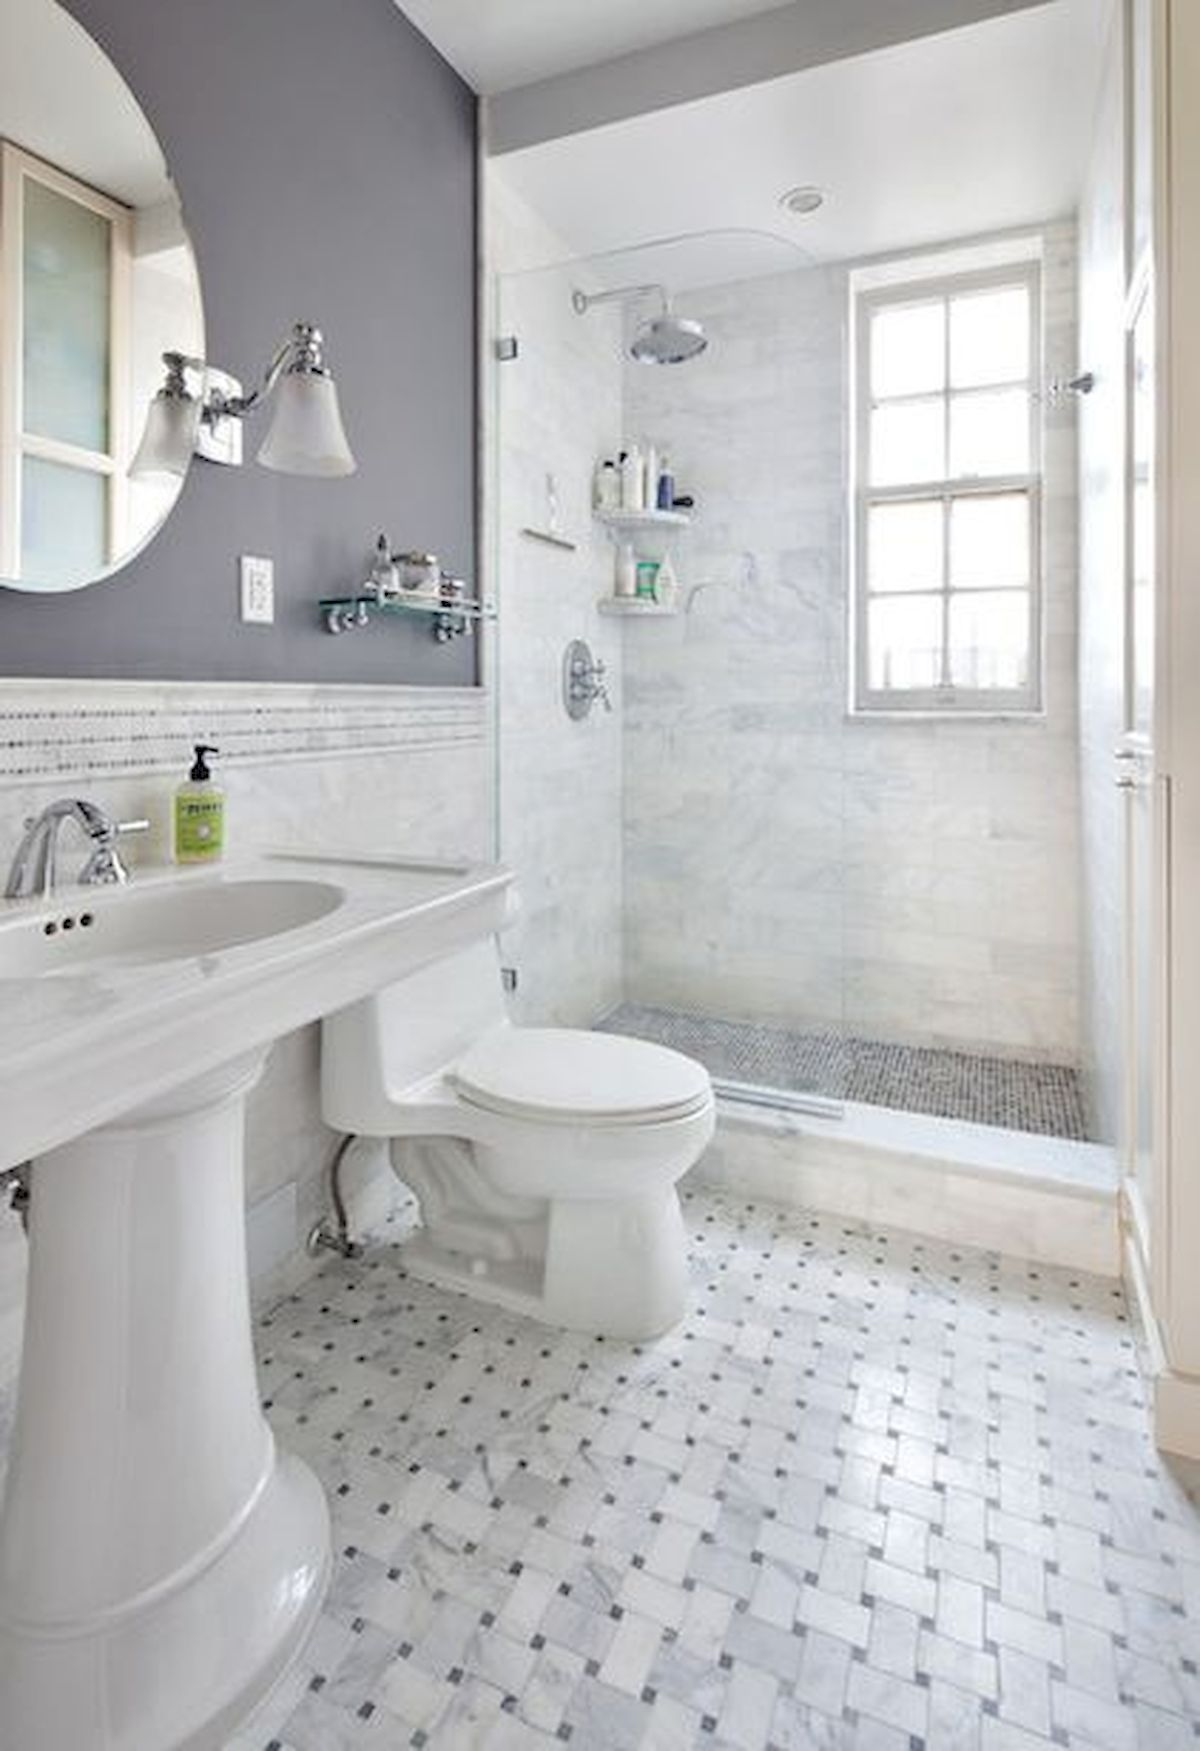 Nice 60 Elegant Small Master Bathroom Remodel Ideas Https Livingmarch Com 60 Elegant Small M Bathroom Remodel Master Small Bathroom Remodel Bathrooms Remodel